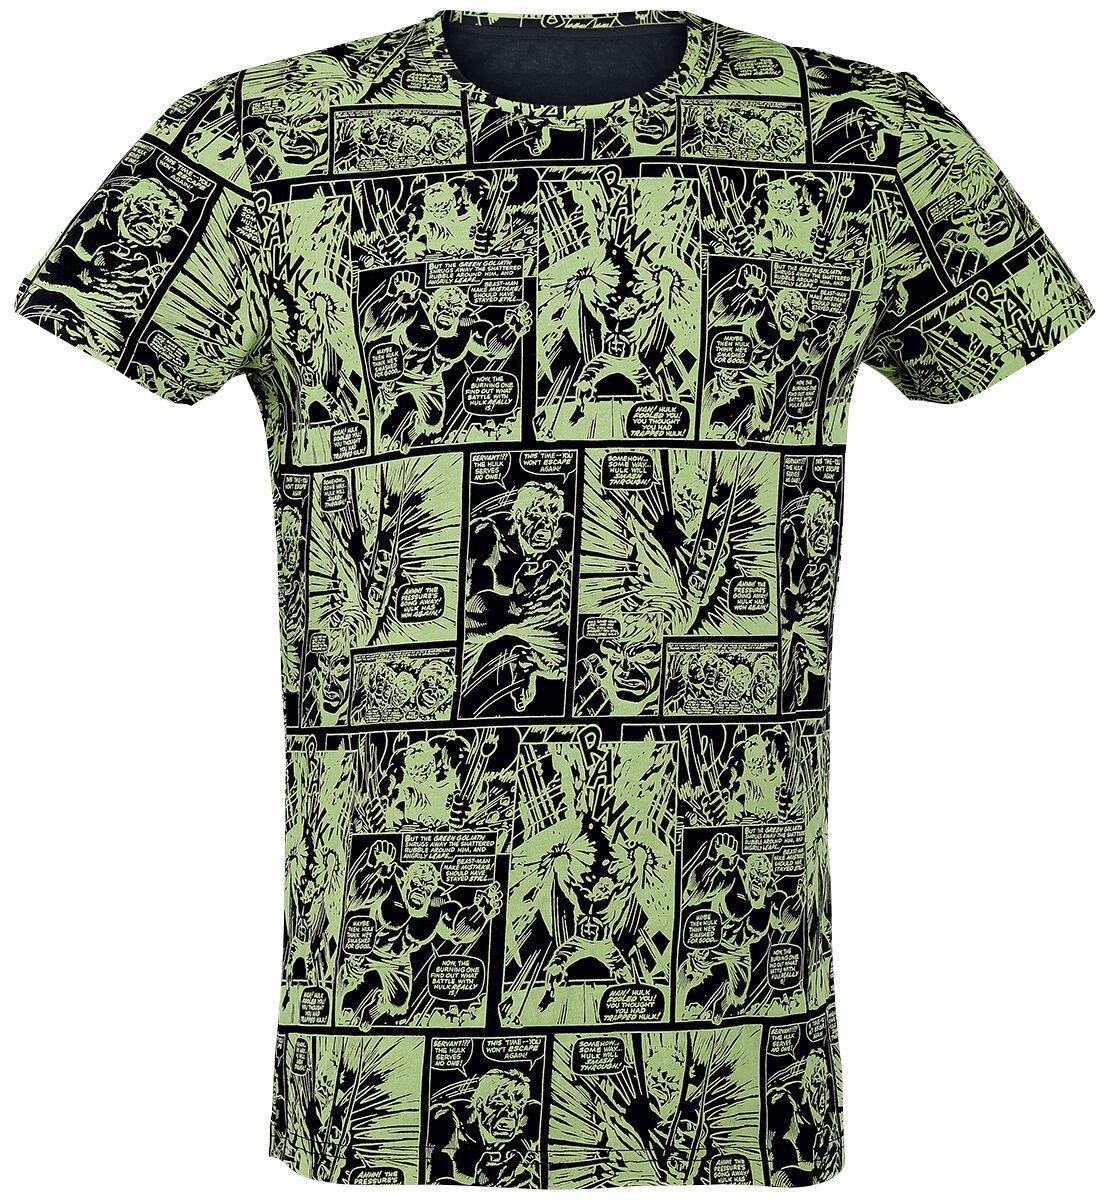 Merch dla Fanów - Koszulki - T-Shirt Hulk Comic Strip T-Shirt allover - 331046